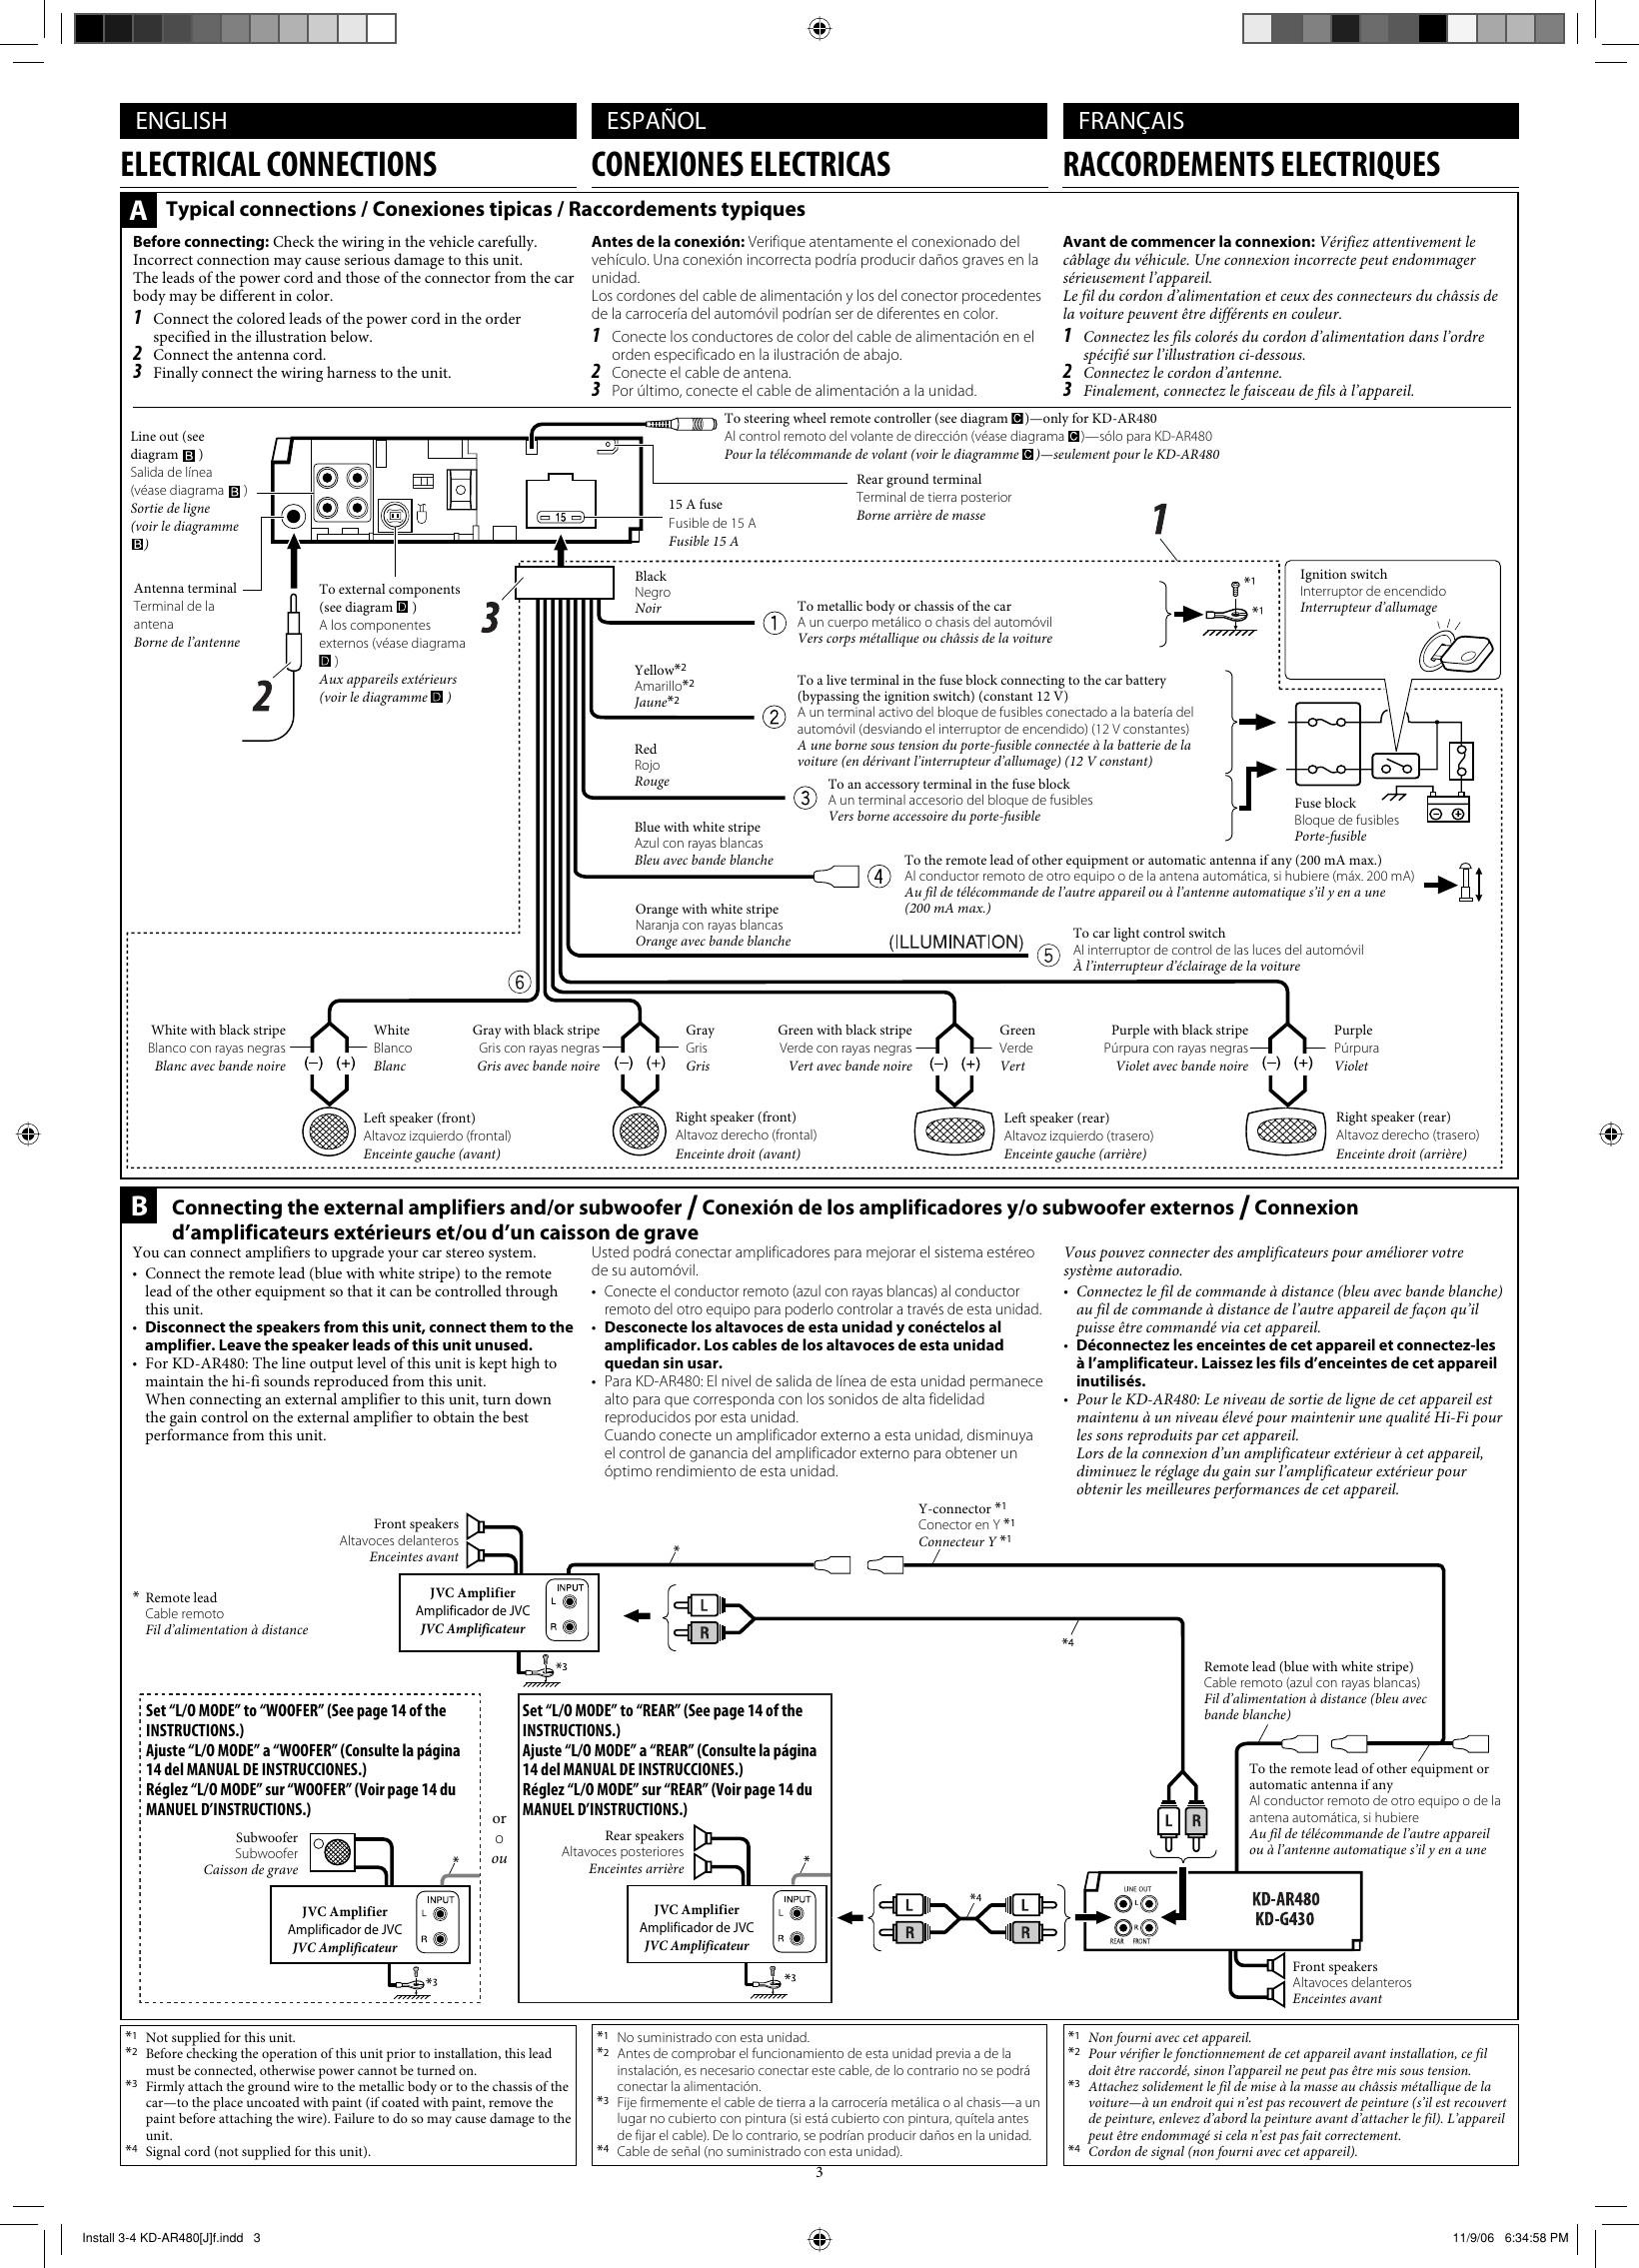 Jvc Kd-sr60 Wiring Diagram Jvc Kd G430 Installation Manual Install 1 2 Ar480[j]2 Of Jvc Kd-sr60 Wiring Diagram